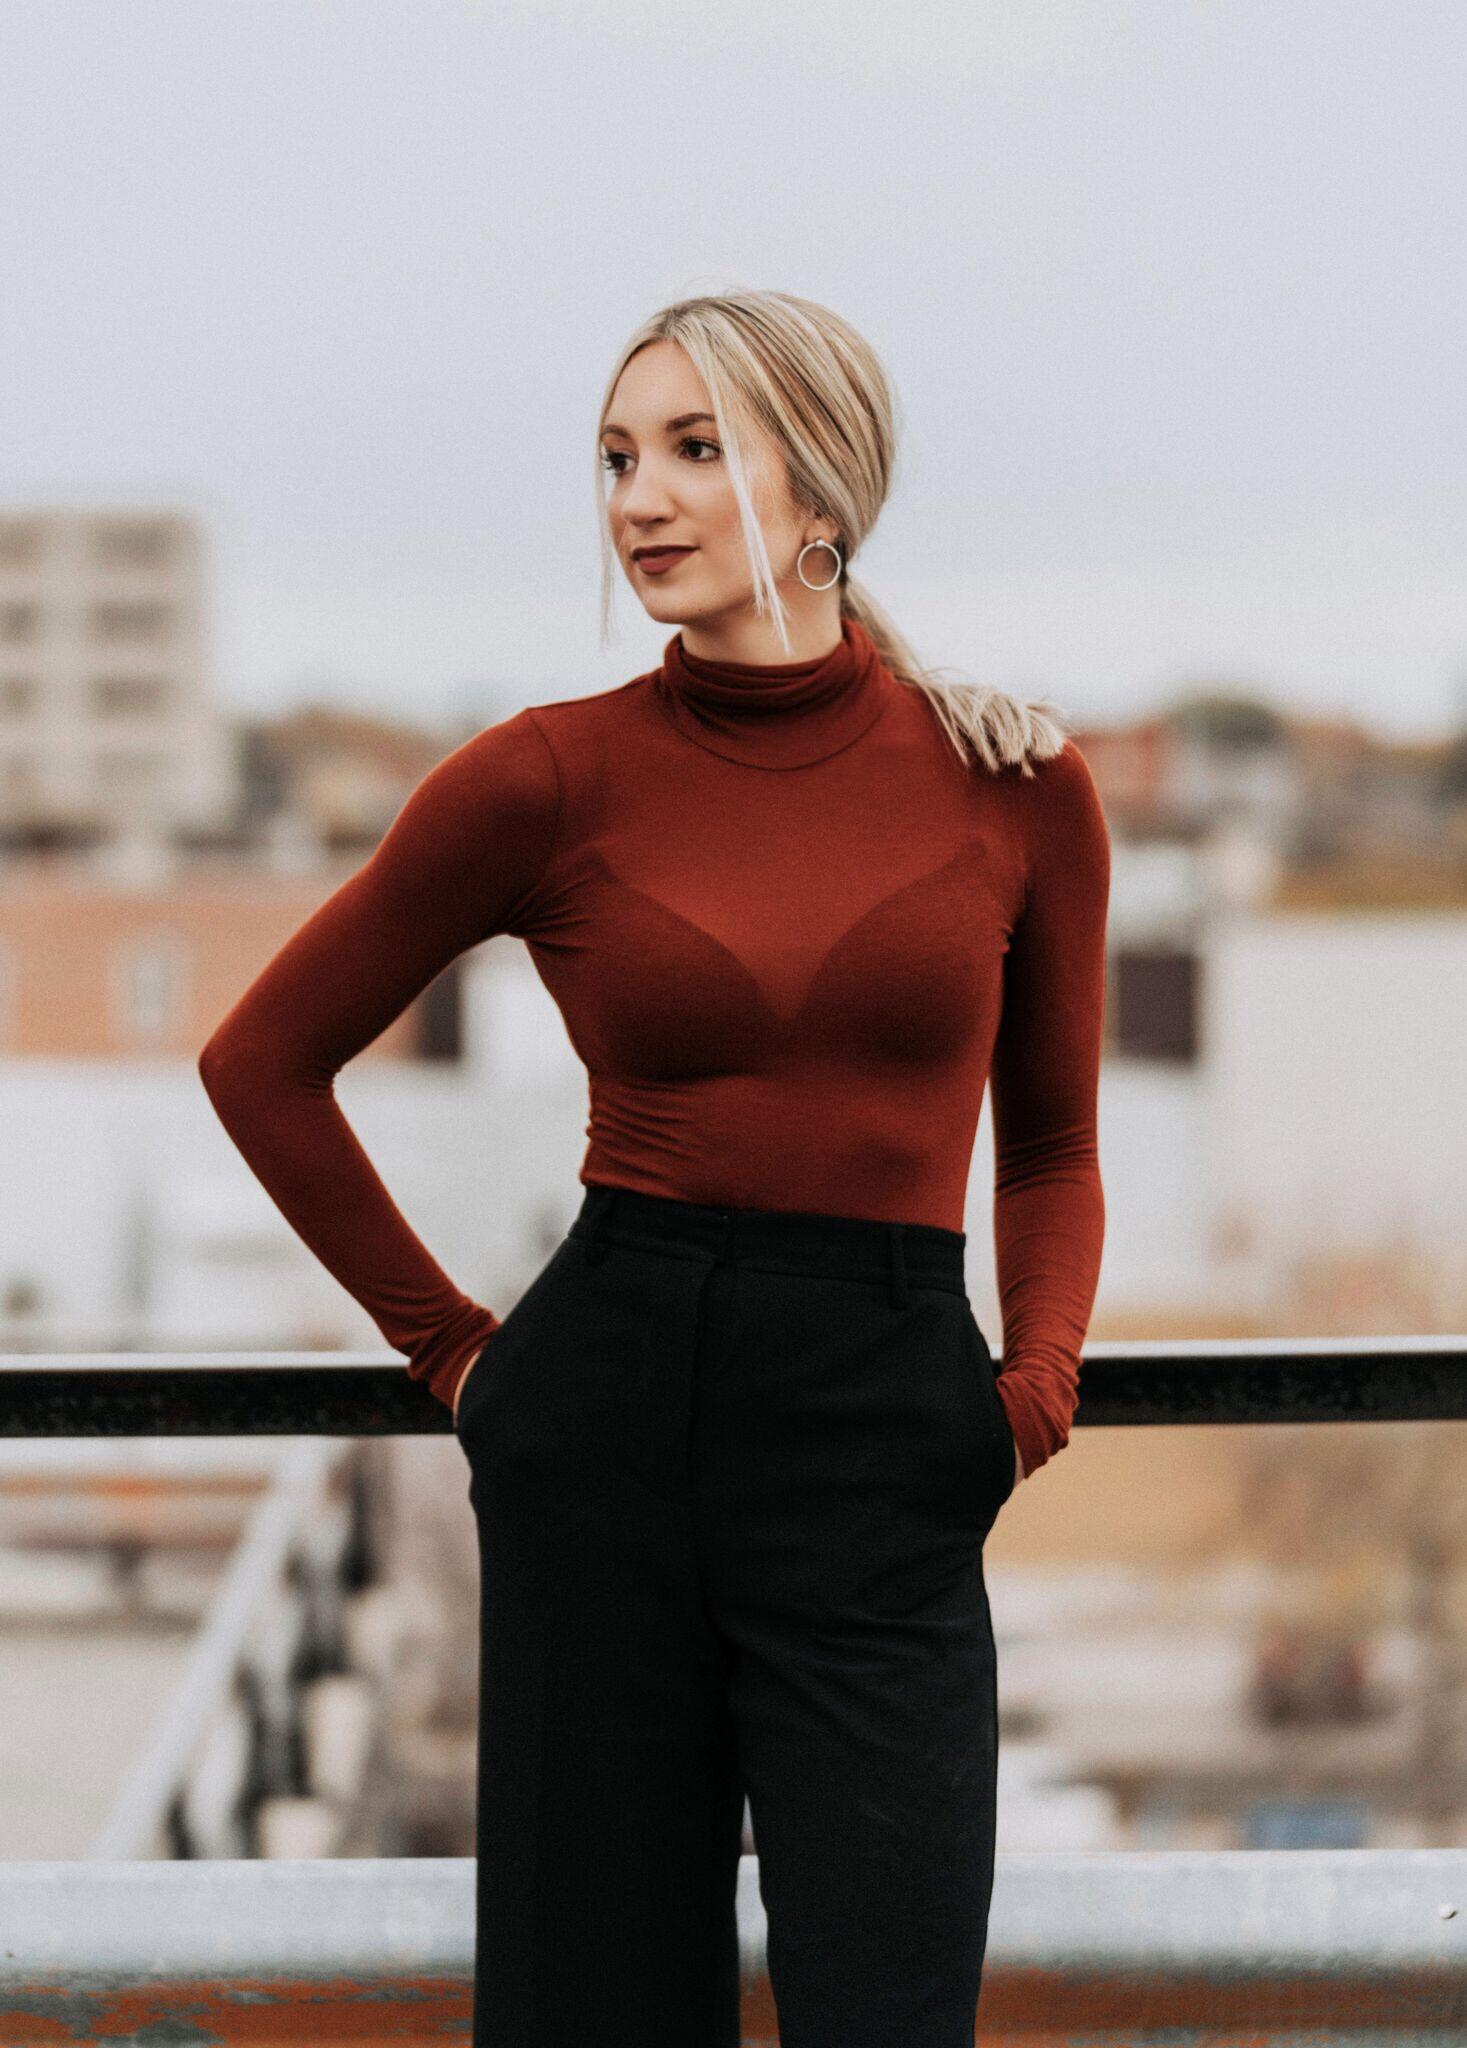 brittany laurén brittanylaurens saskatoon saskatchewan canada fashion ootd style inspiration aritzia blogger youtuber